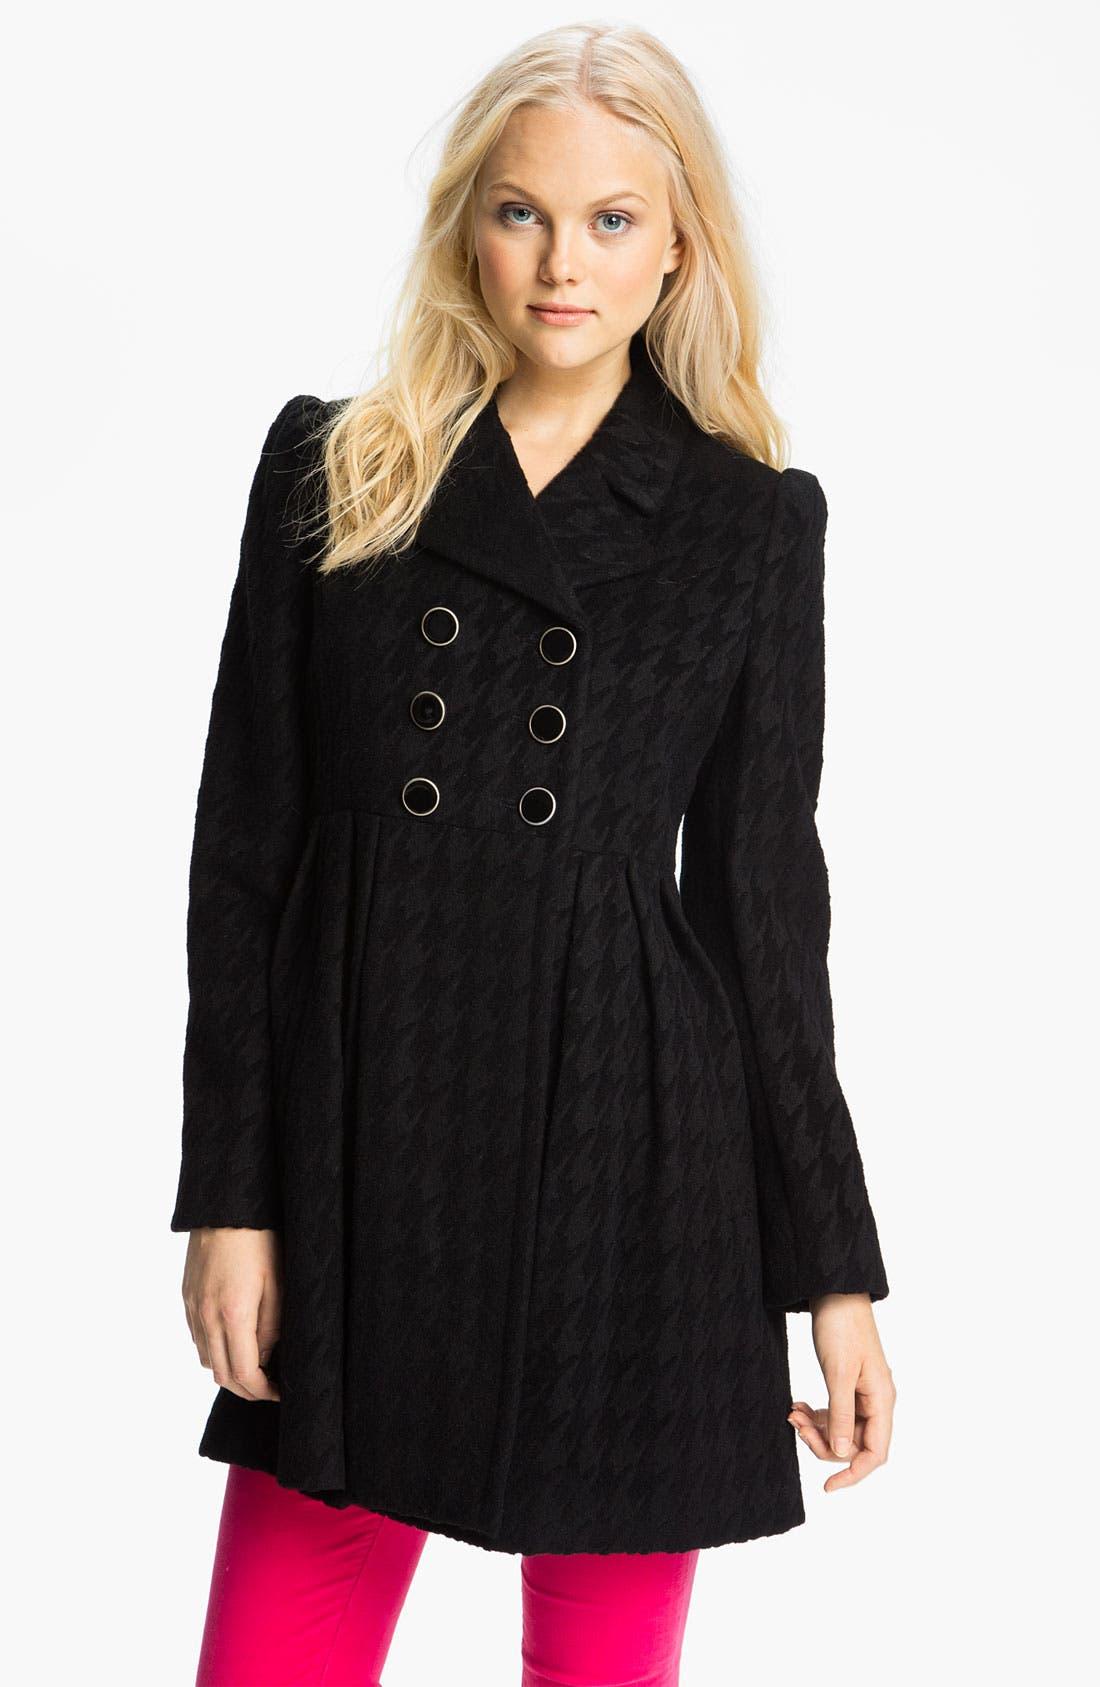 Alternate Image 1 Selected - Betsey Johnson Houndstooth Walking Coat